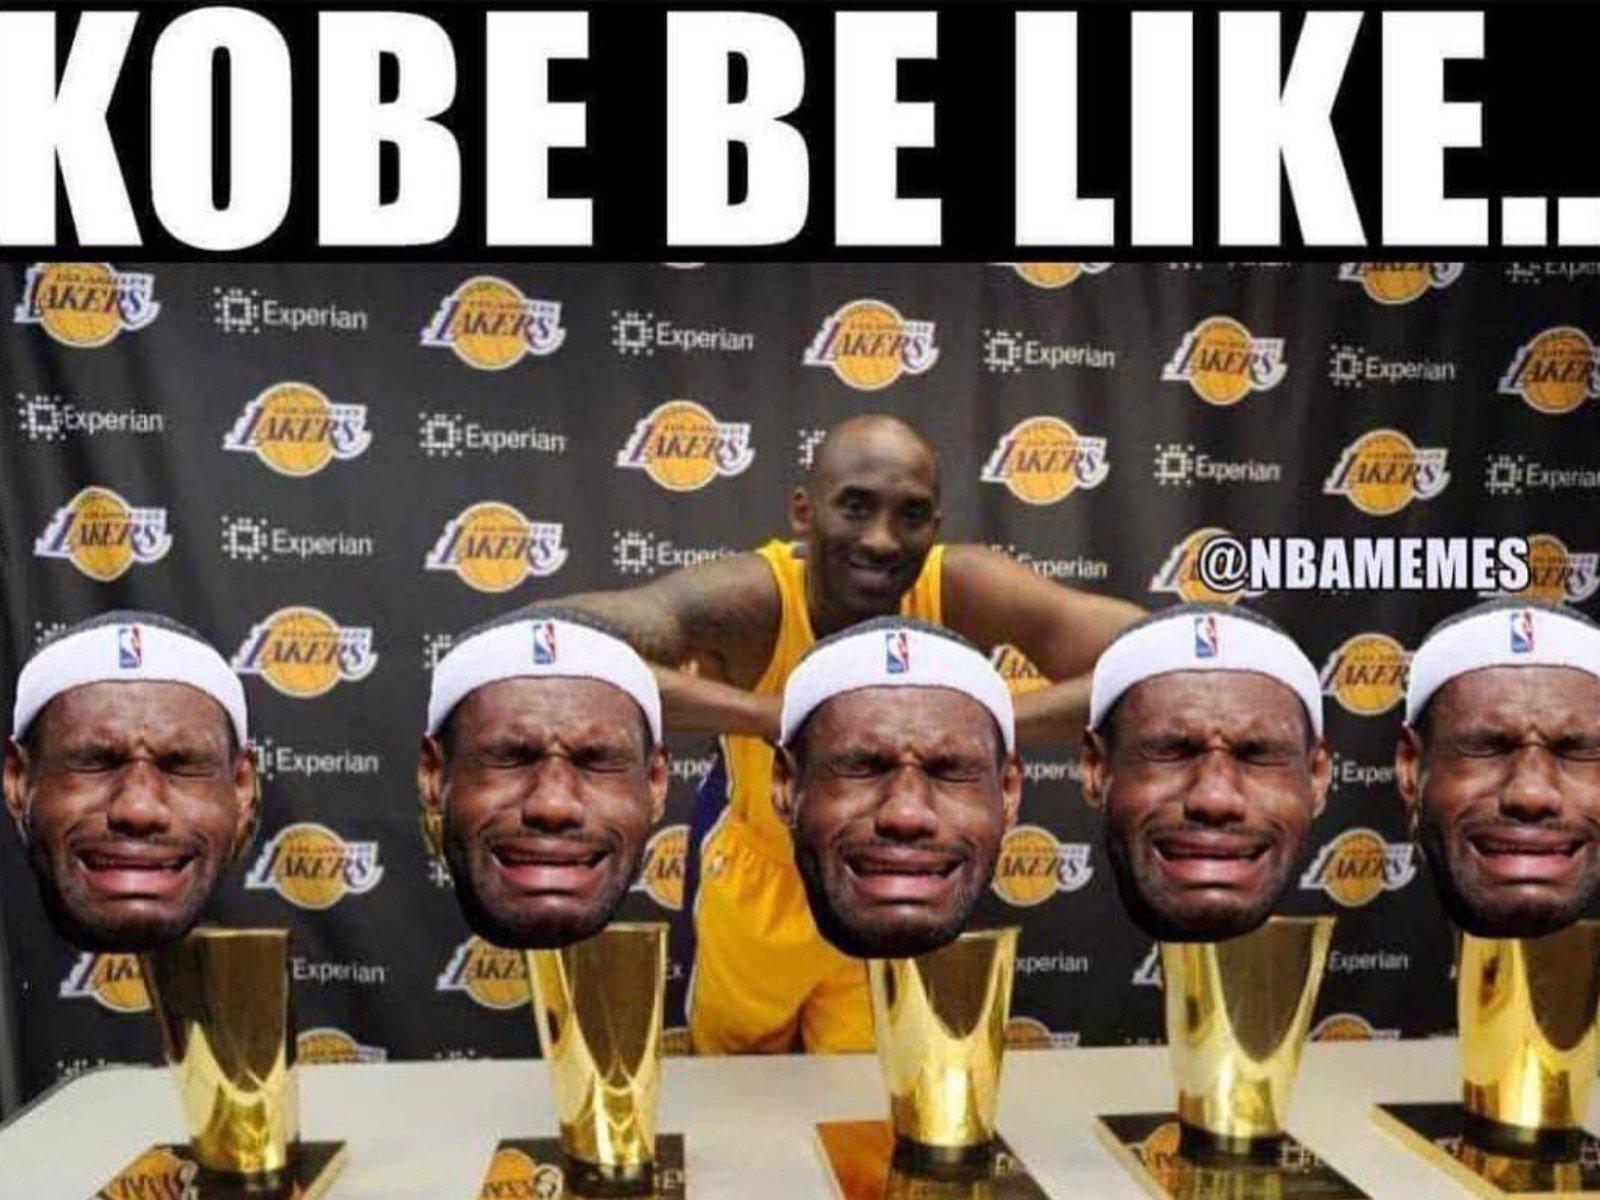 Kobe NBA Finals LeBron Meme